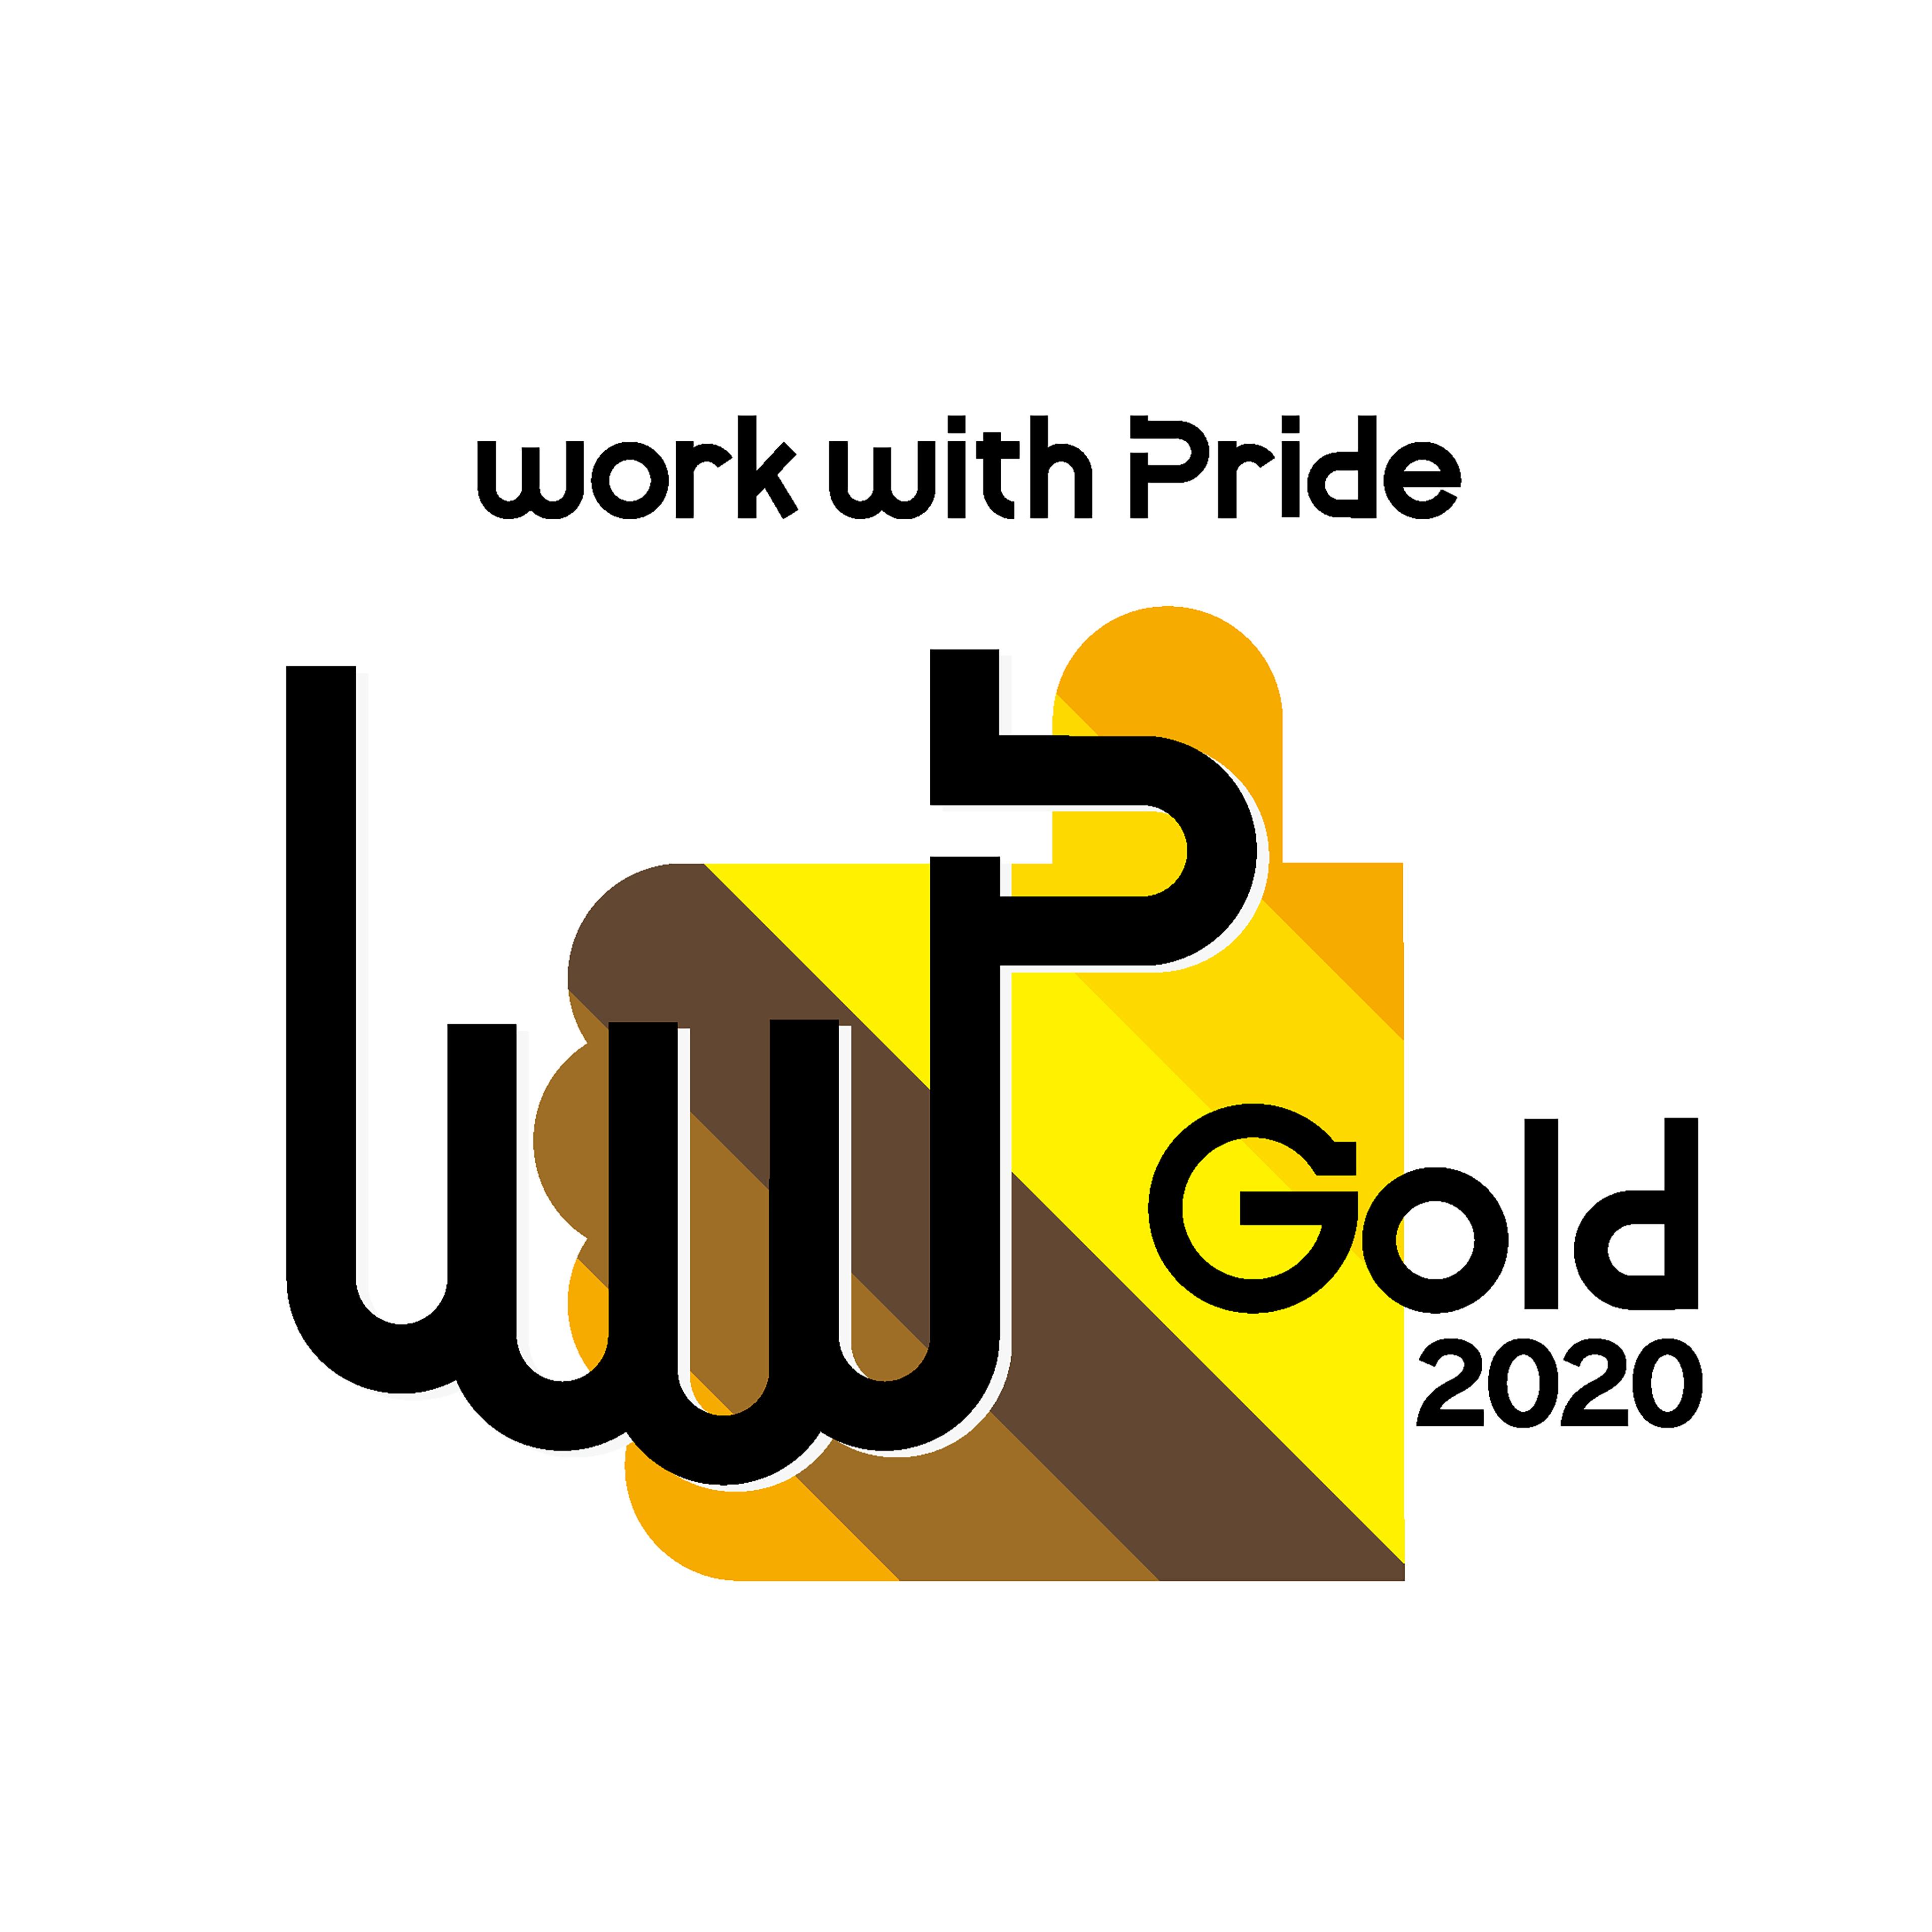 EY Japan、LGBT+に関する企業の取組み指標「PRIDE指標」で最高評価の「ゴールド」を4年連続で受賞